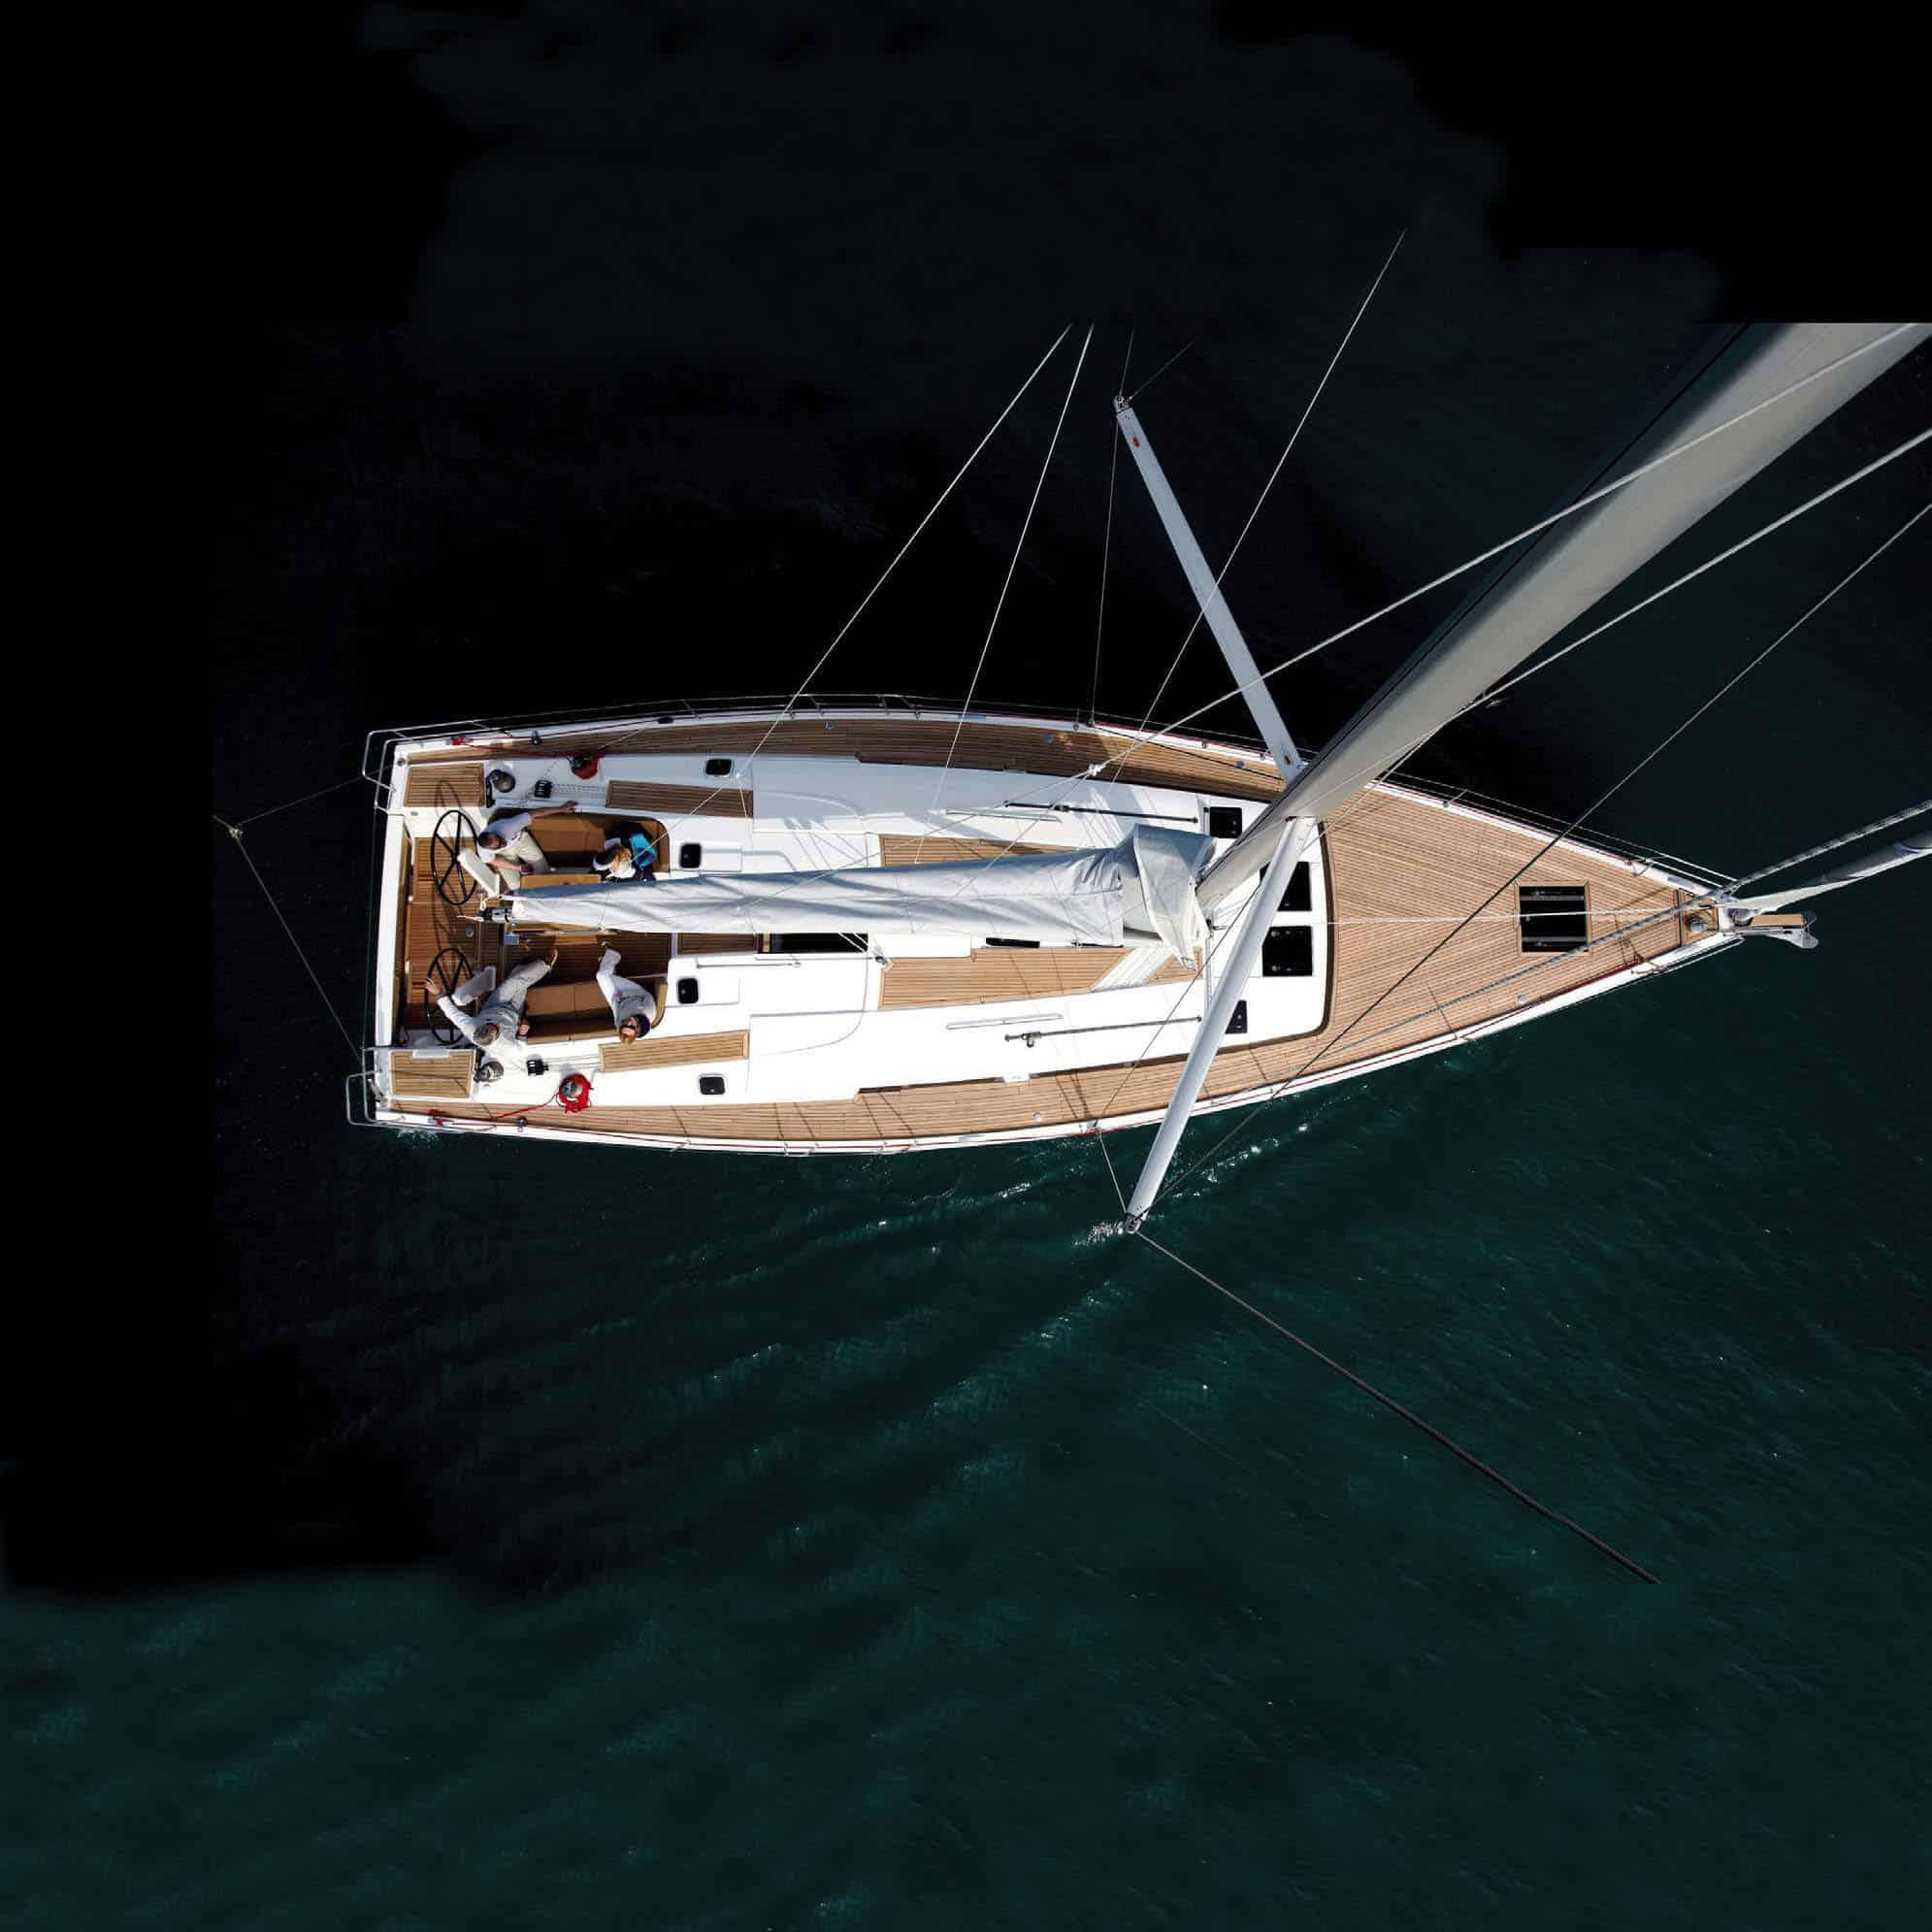 Barca classe 2011: ecco i modelli di Hanse, Bavaria e Elan